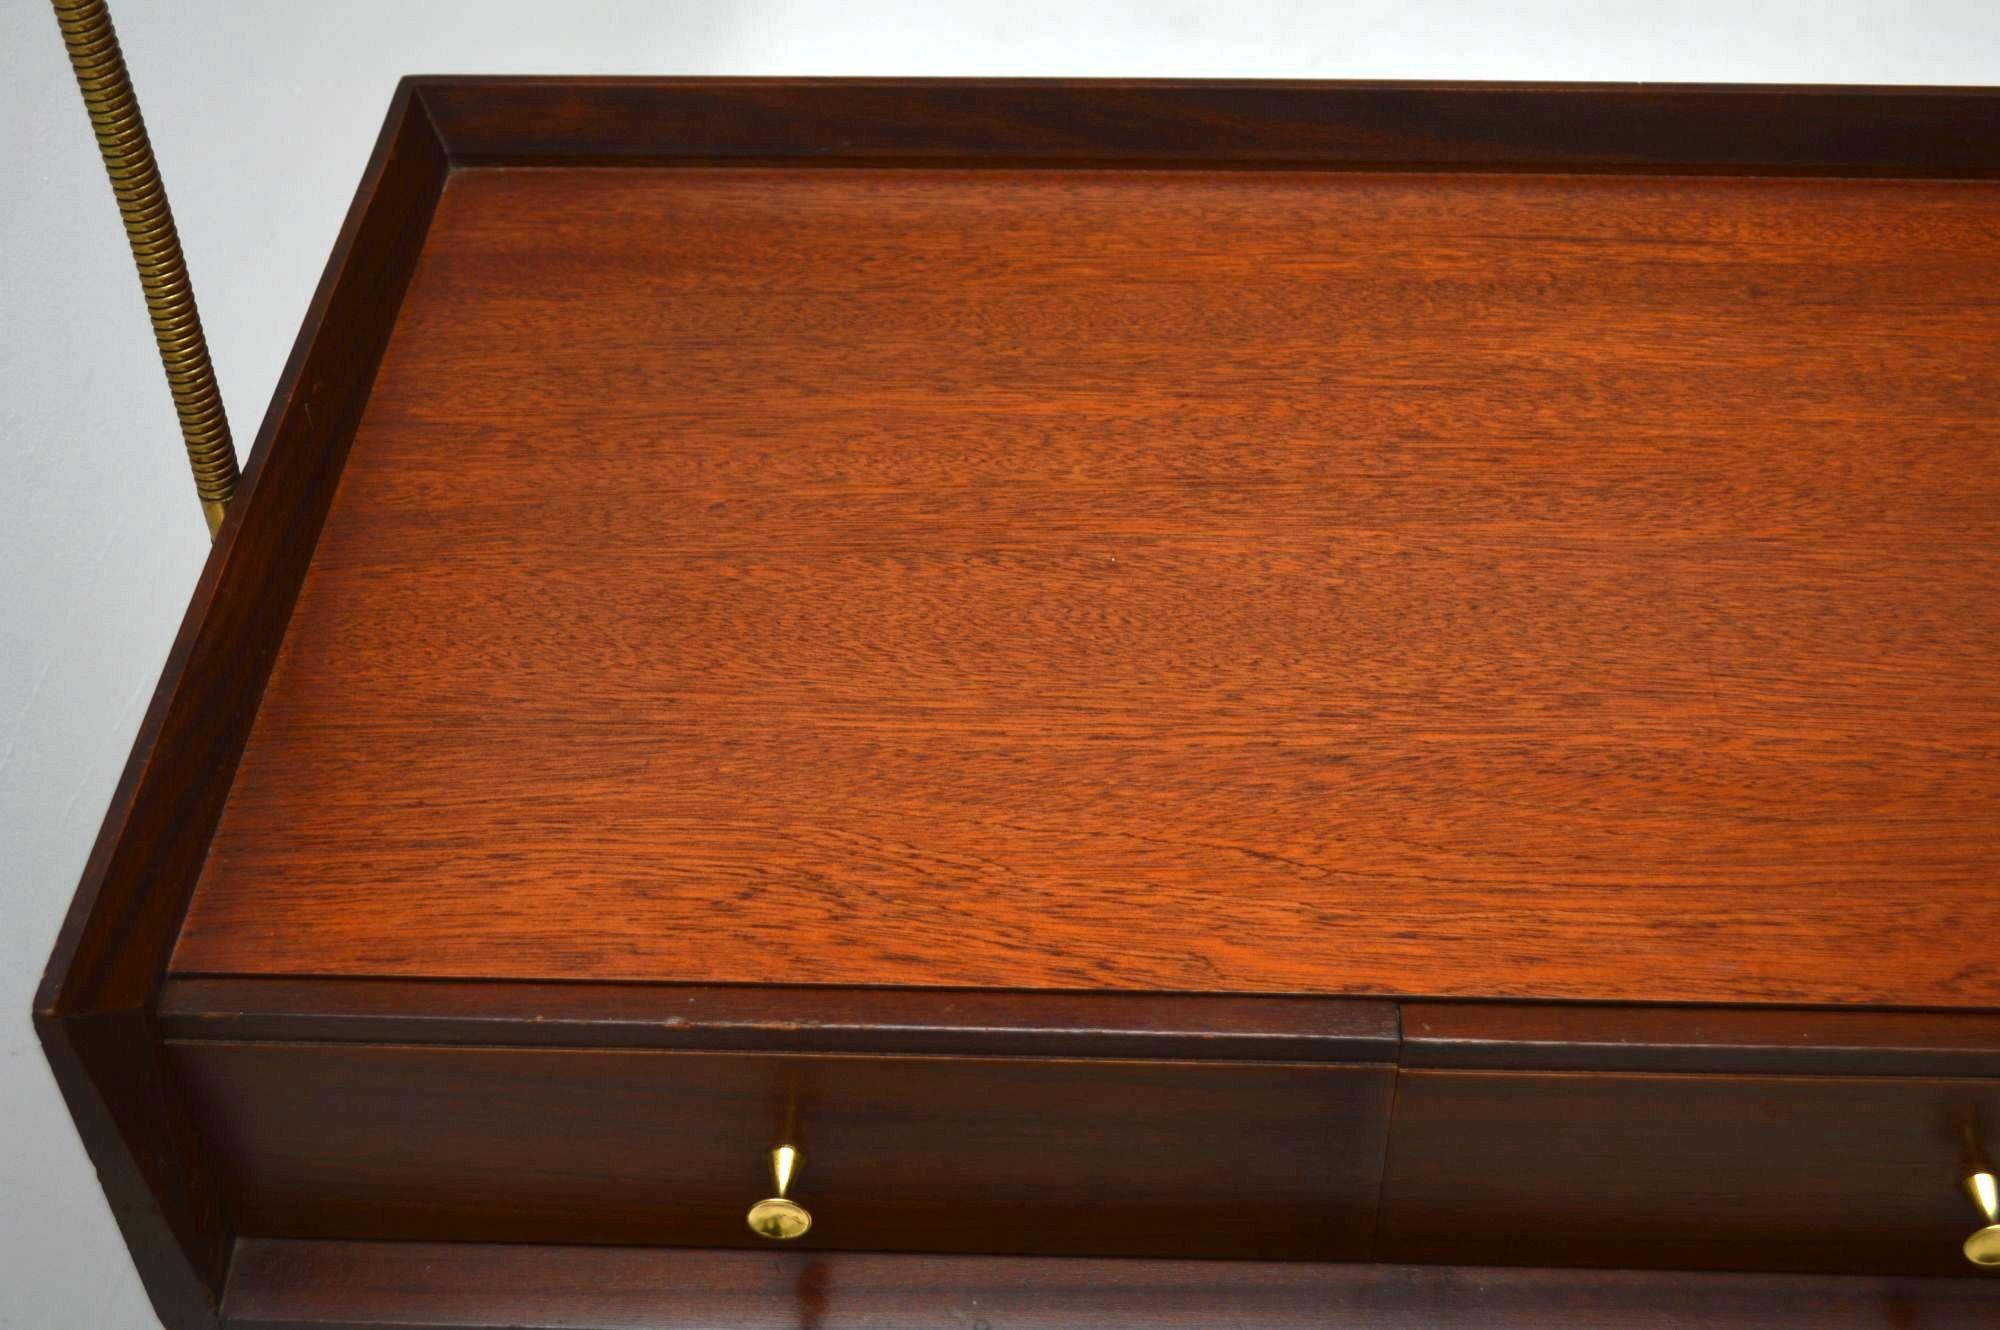 Retro Mahogany Desk Dressing Table With Lamp Vintage